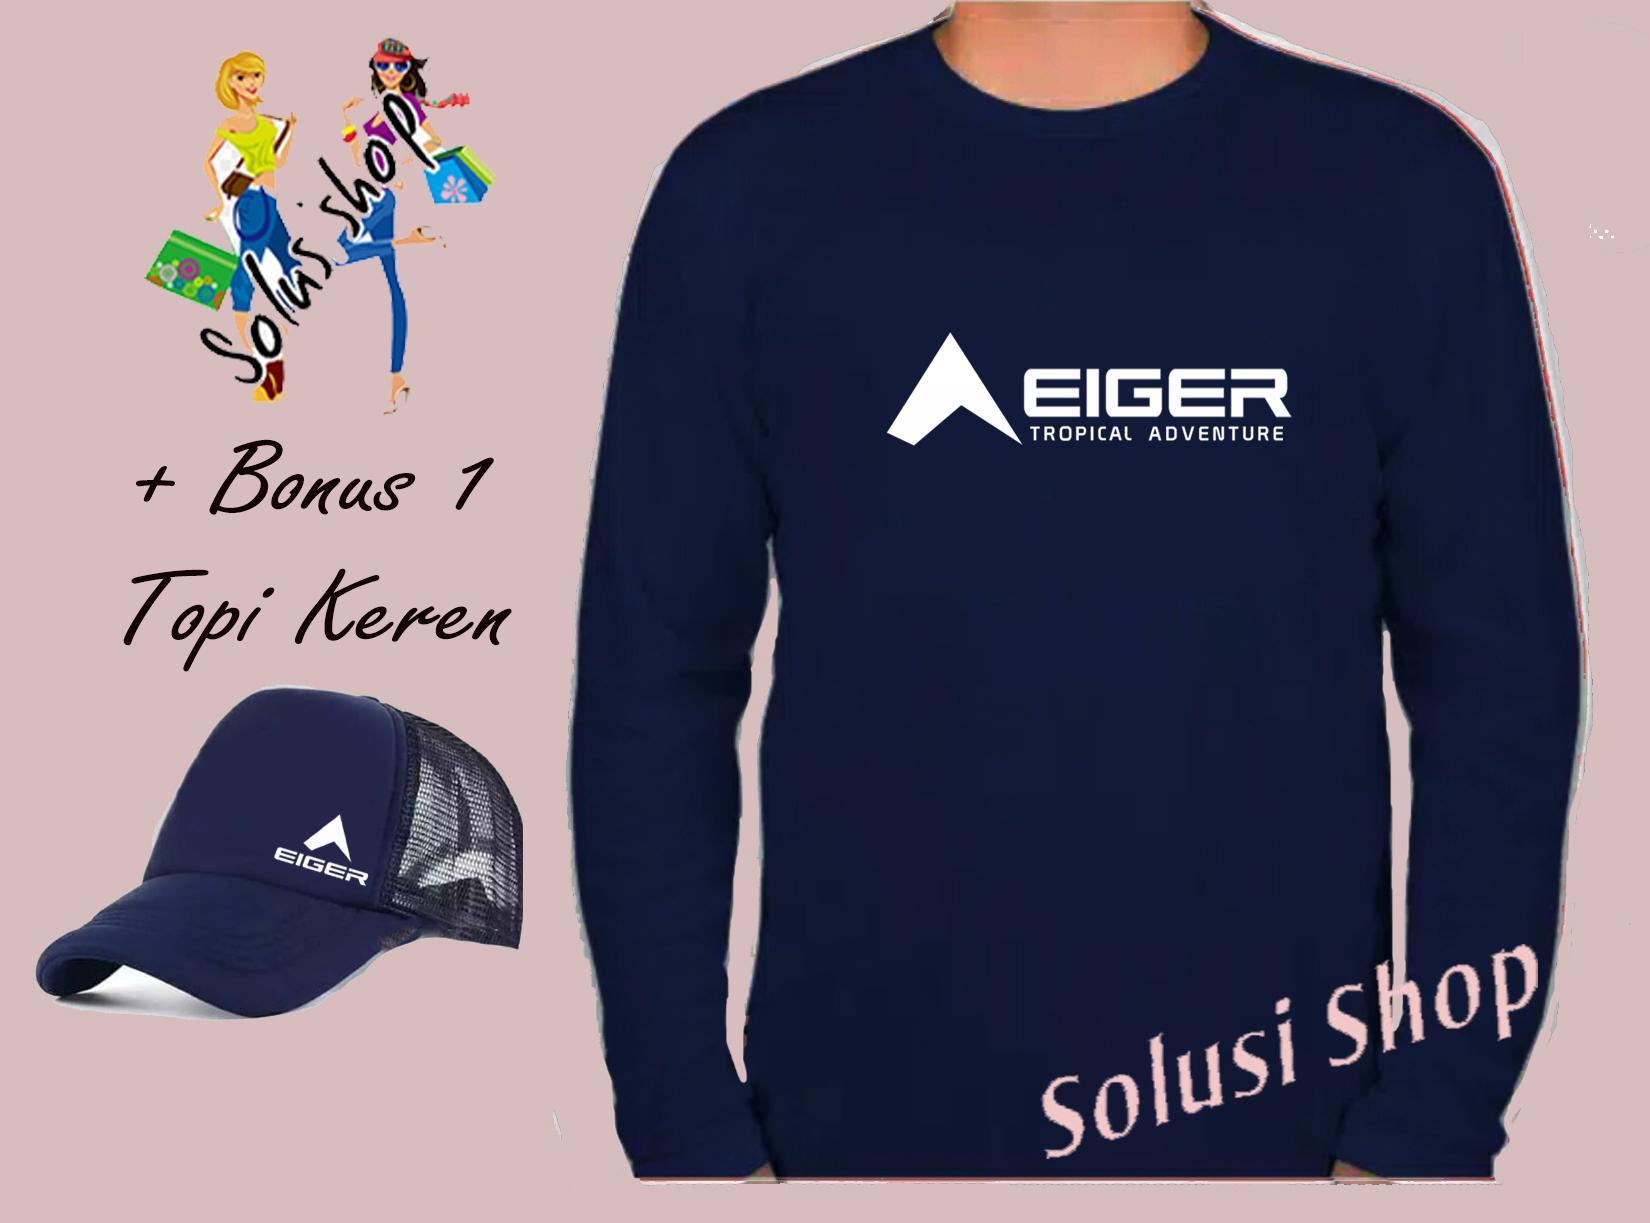 PROMO...! Baju Kaos Lengan Panjang Eiger Adventure Logo Samping Putih + Topi Keren Premium Solusi Shop